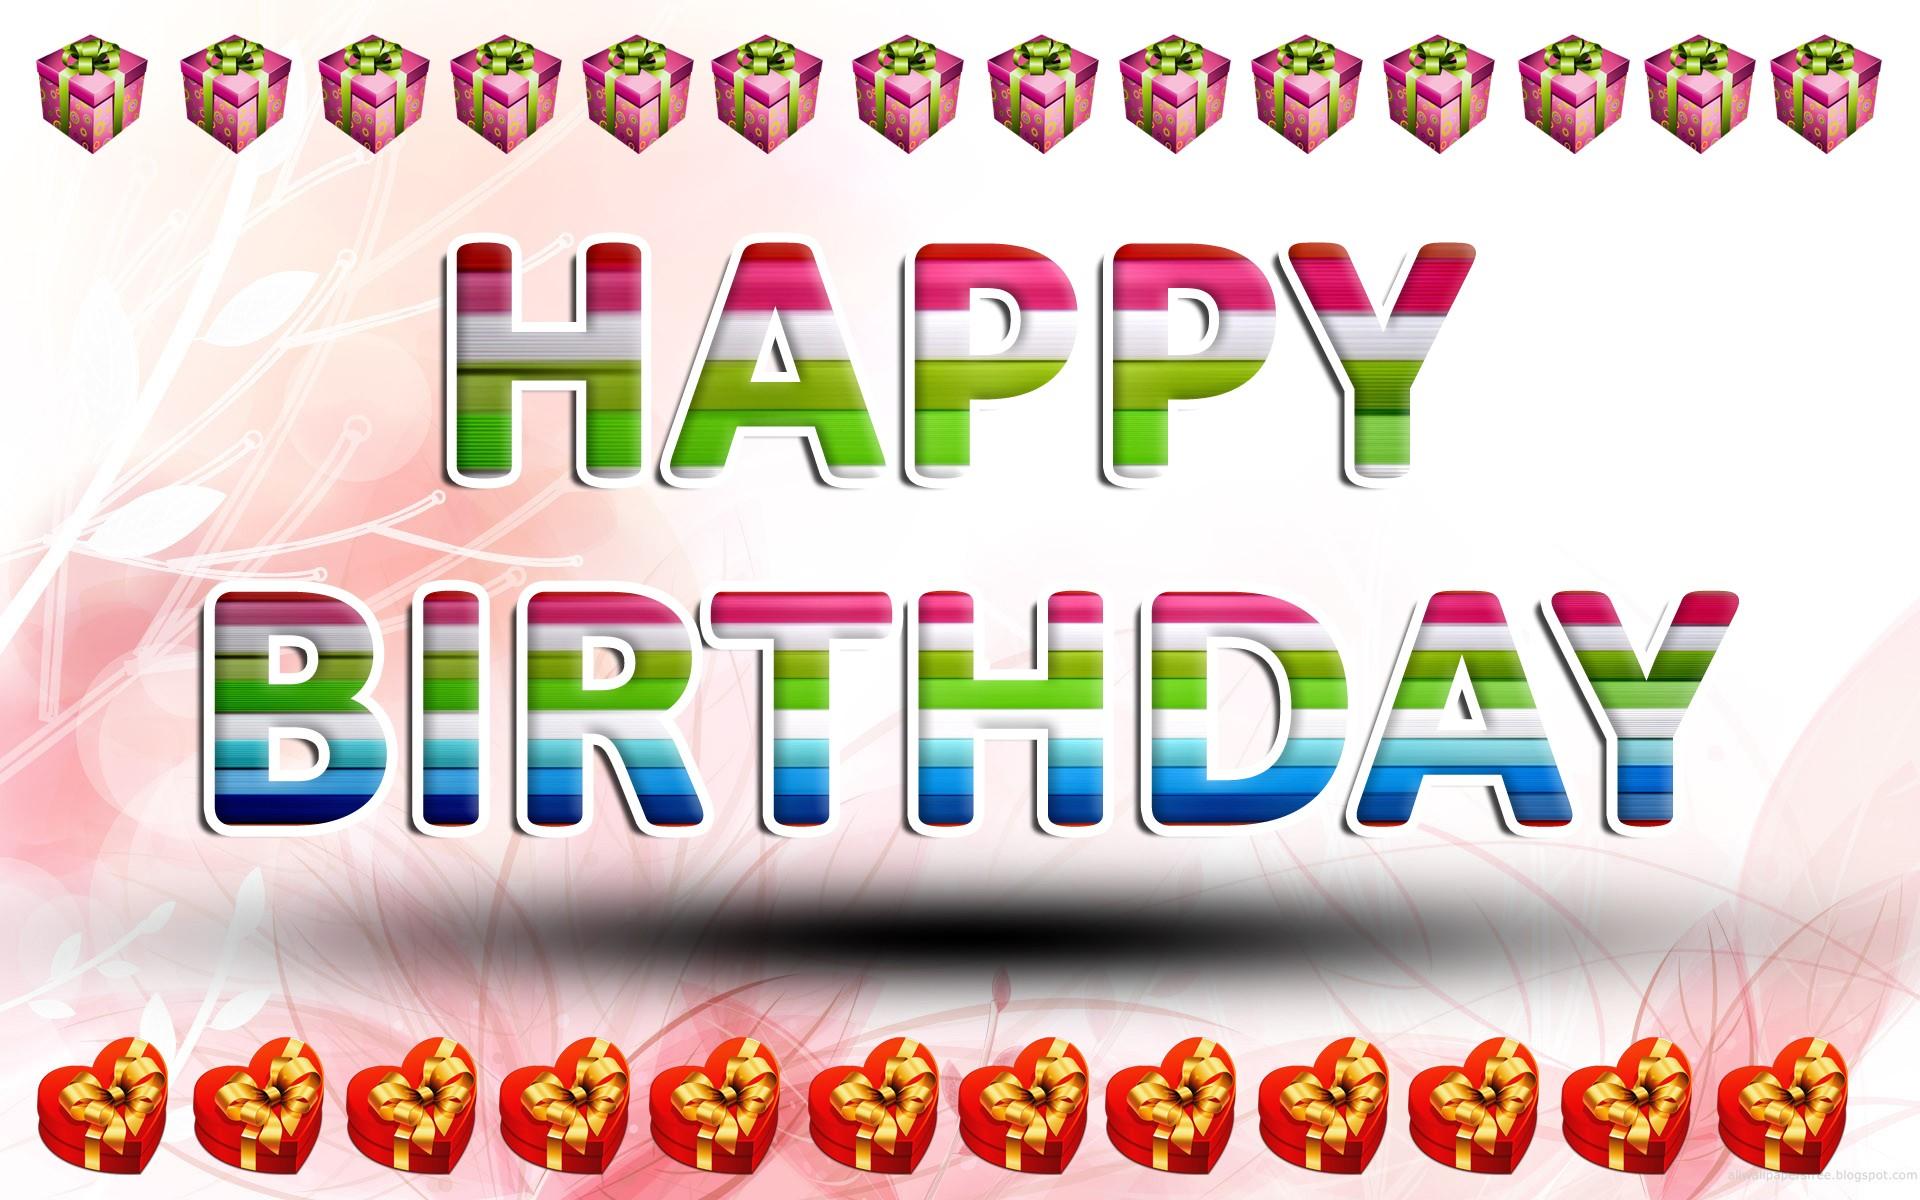 Happy Birthday Wallpaper for Facebook - WallpaperSafari